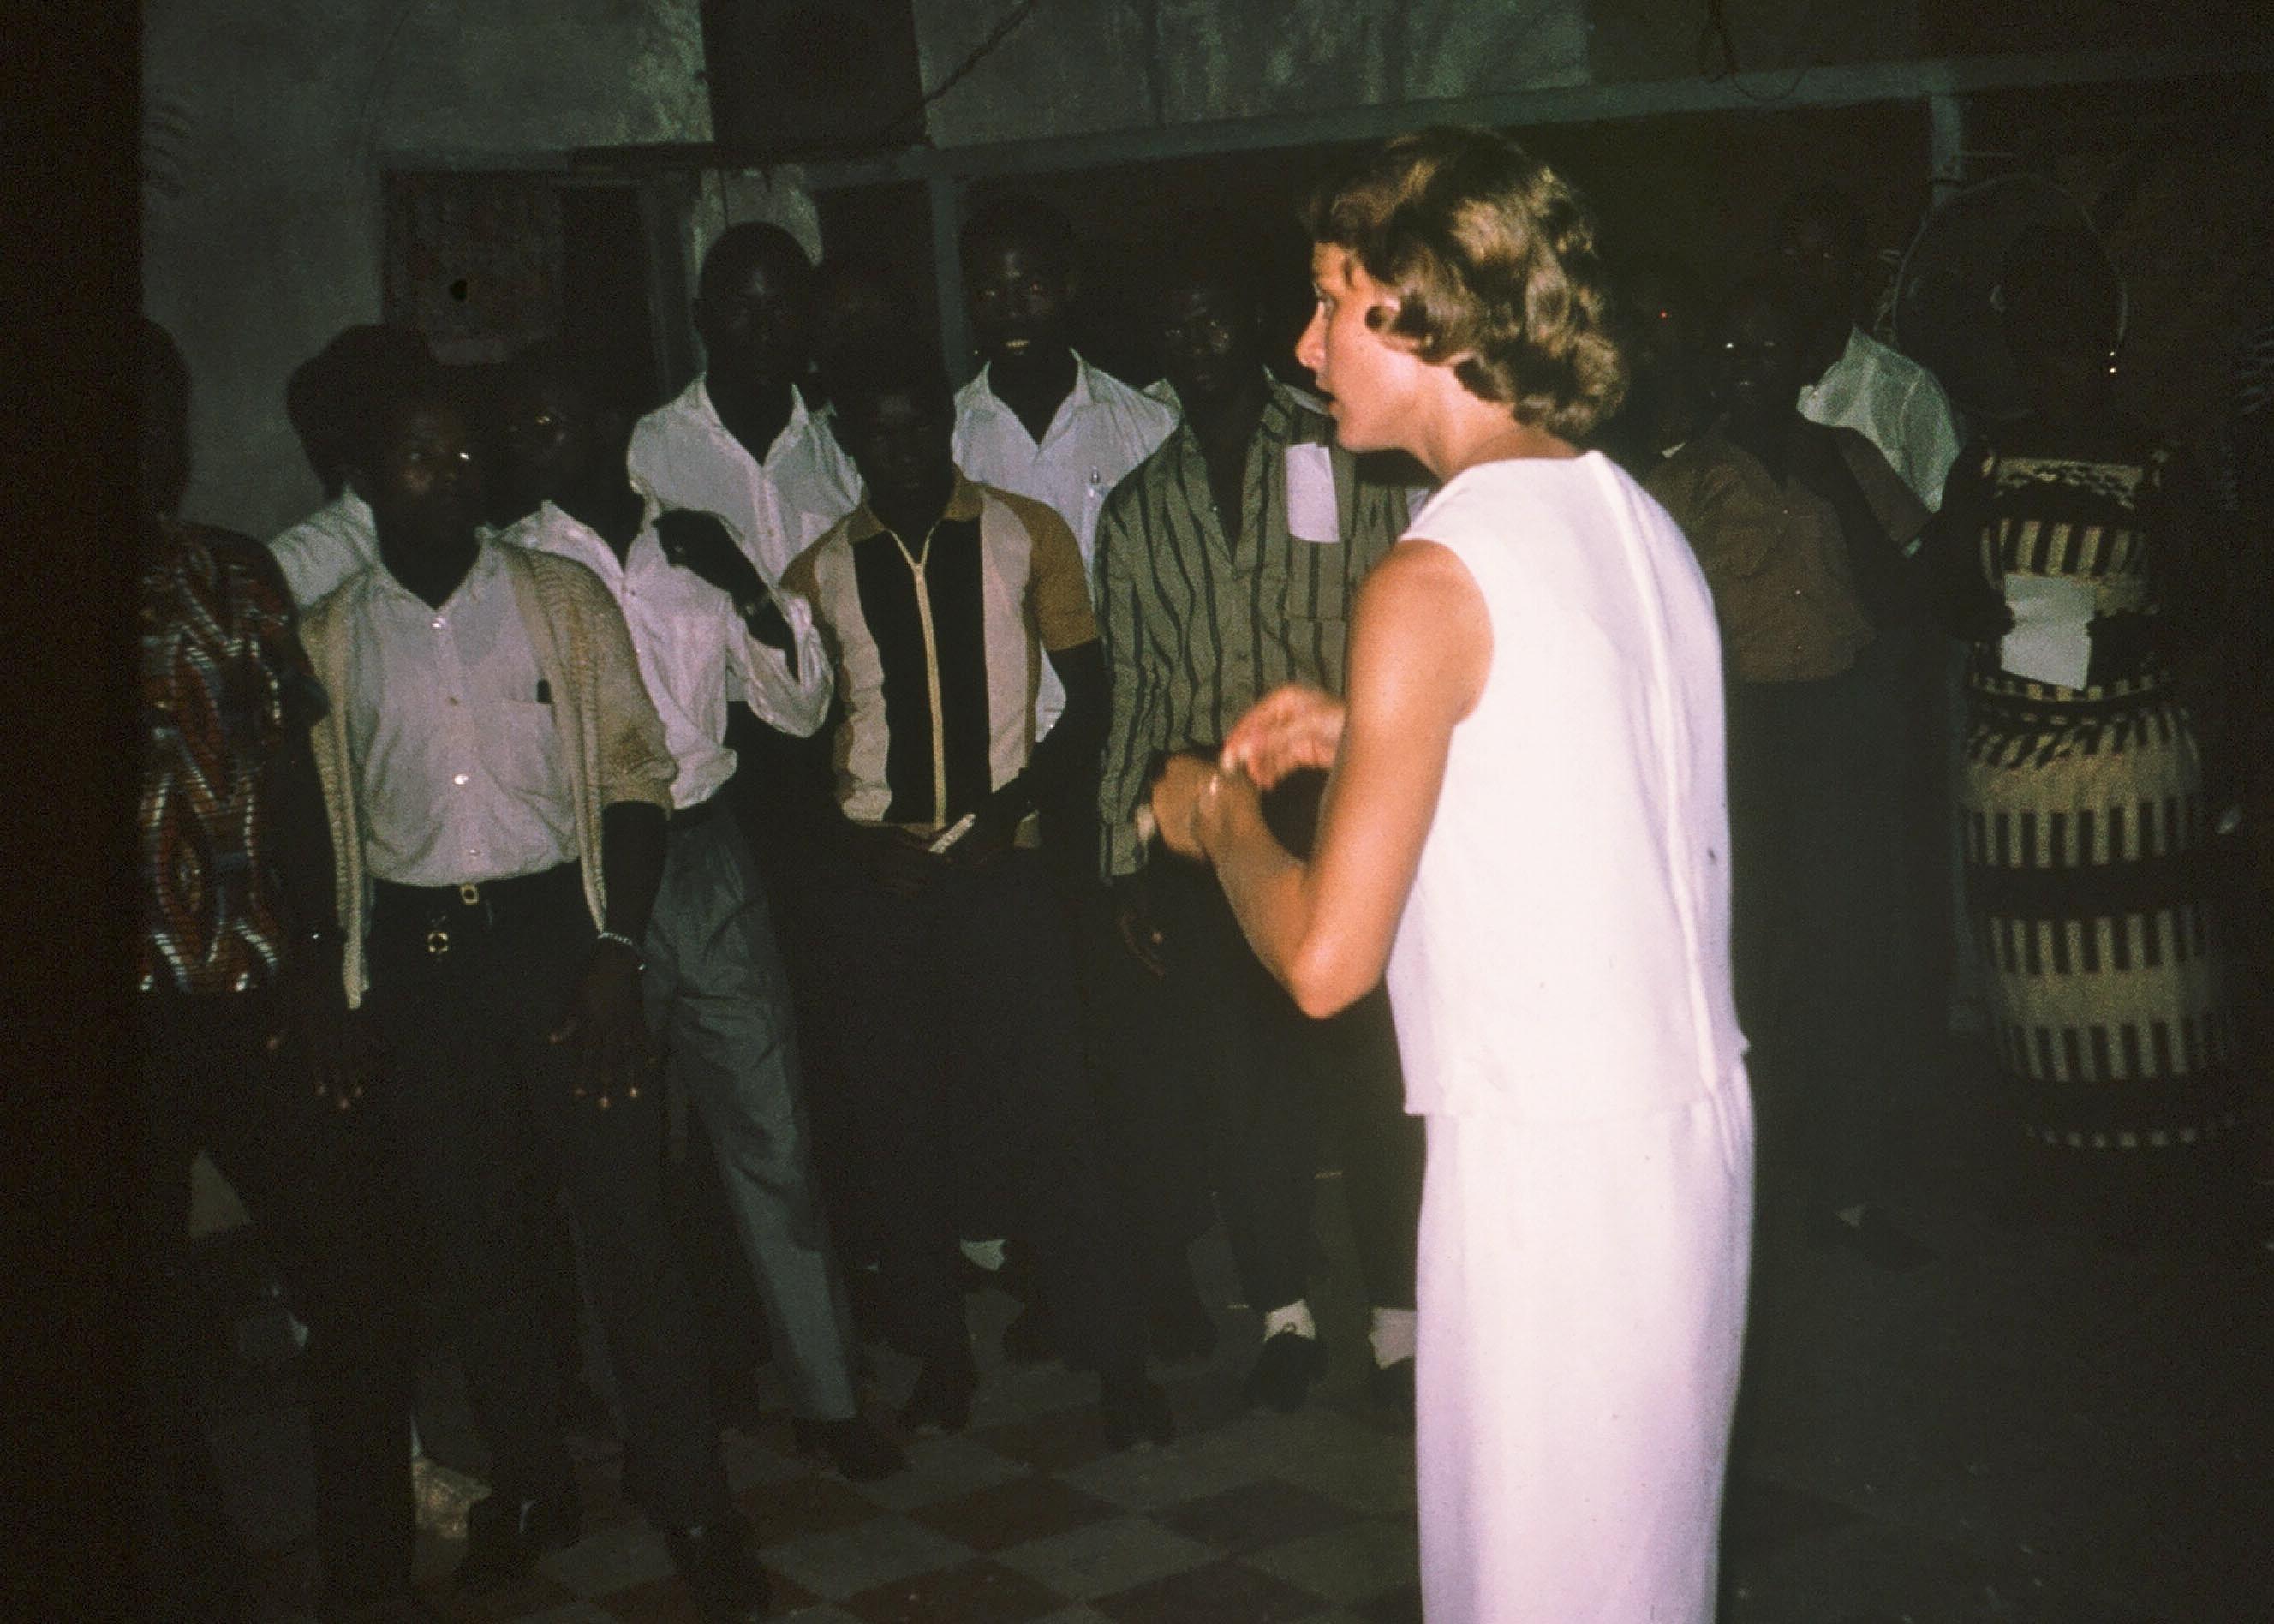 Jo Ann directing her Gboveh High School chorus. At Berkeley, she had belonged to the University's elite Glee Club.